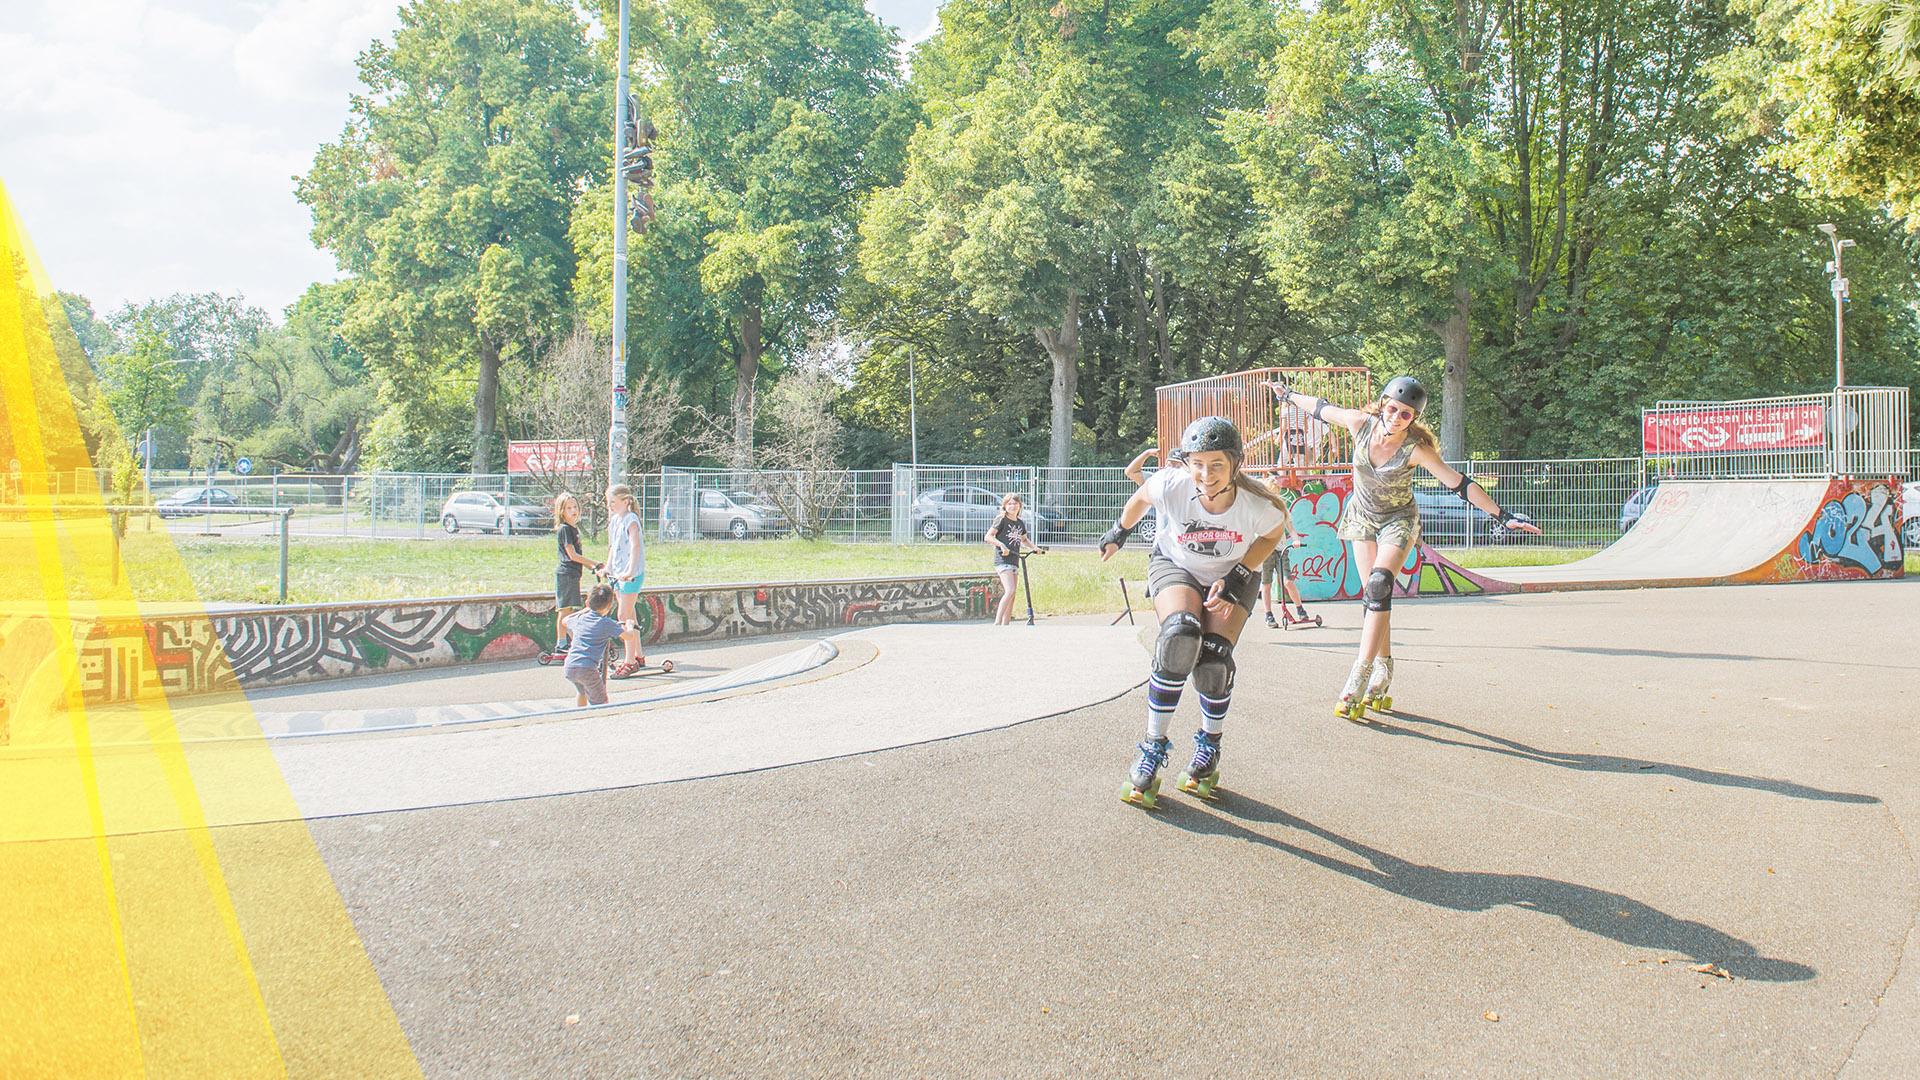 Linda IJmker promoot zonnepark op rollerskates